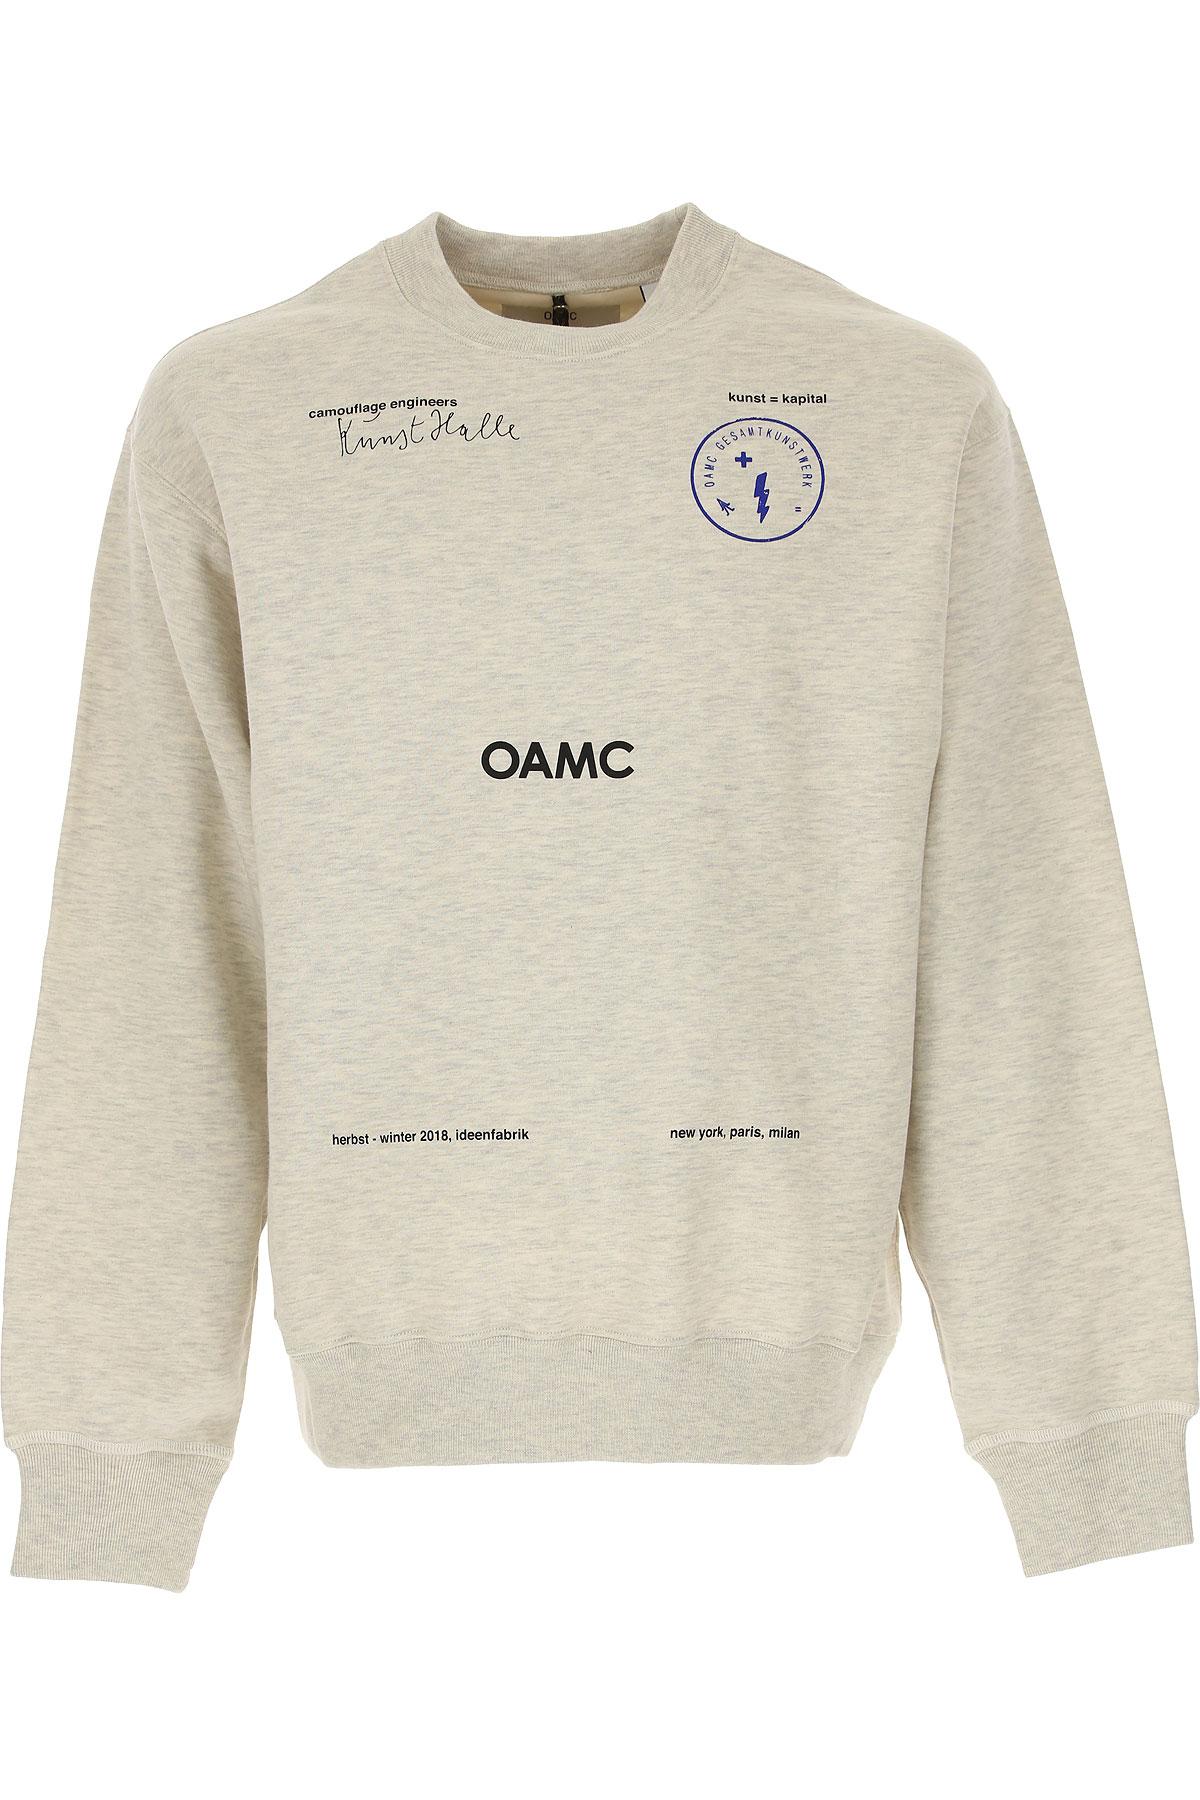 Image of OAMC Sweatshirt for Men, Light Grey, Cotton, 2017, L S